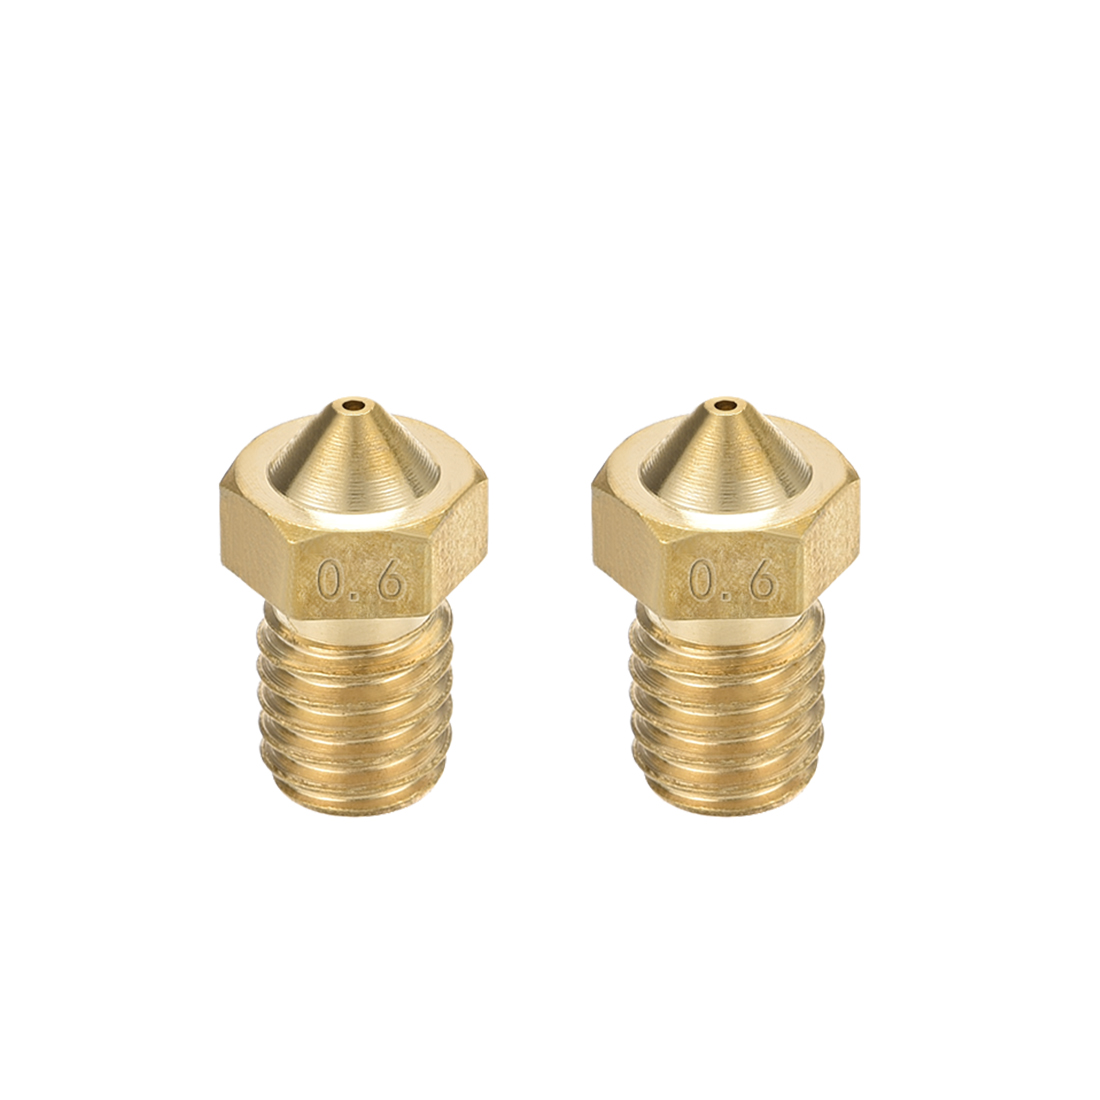 0.6mm 3D Printer Nozzle, Fit for V6, for 1.75mm Filament Brass 2pcs